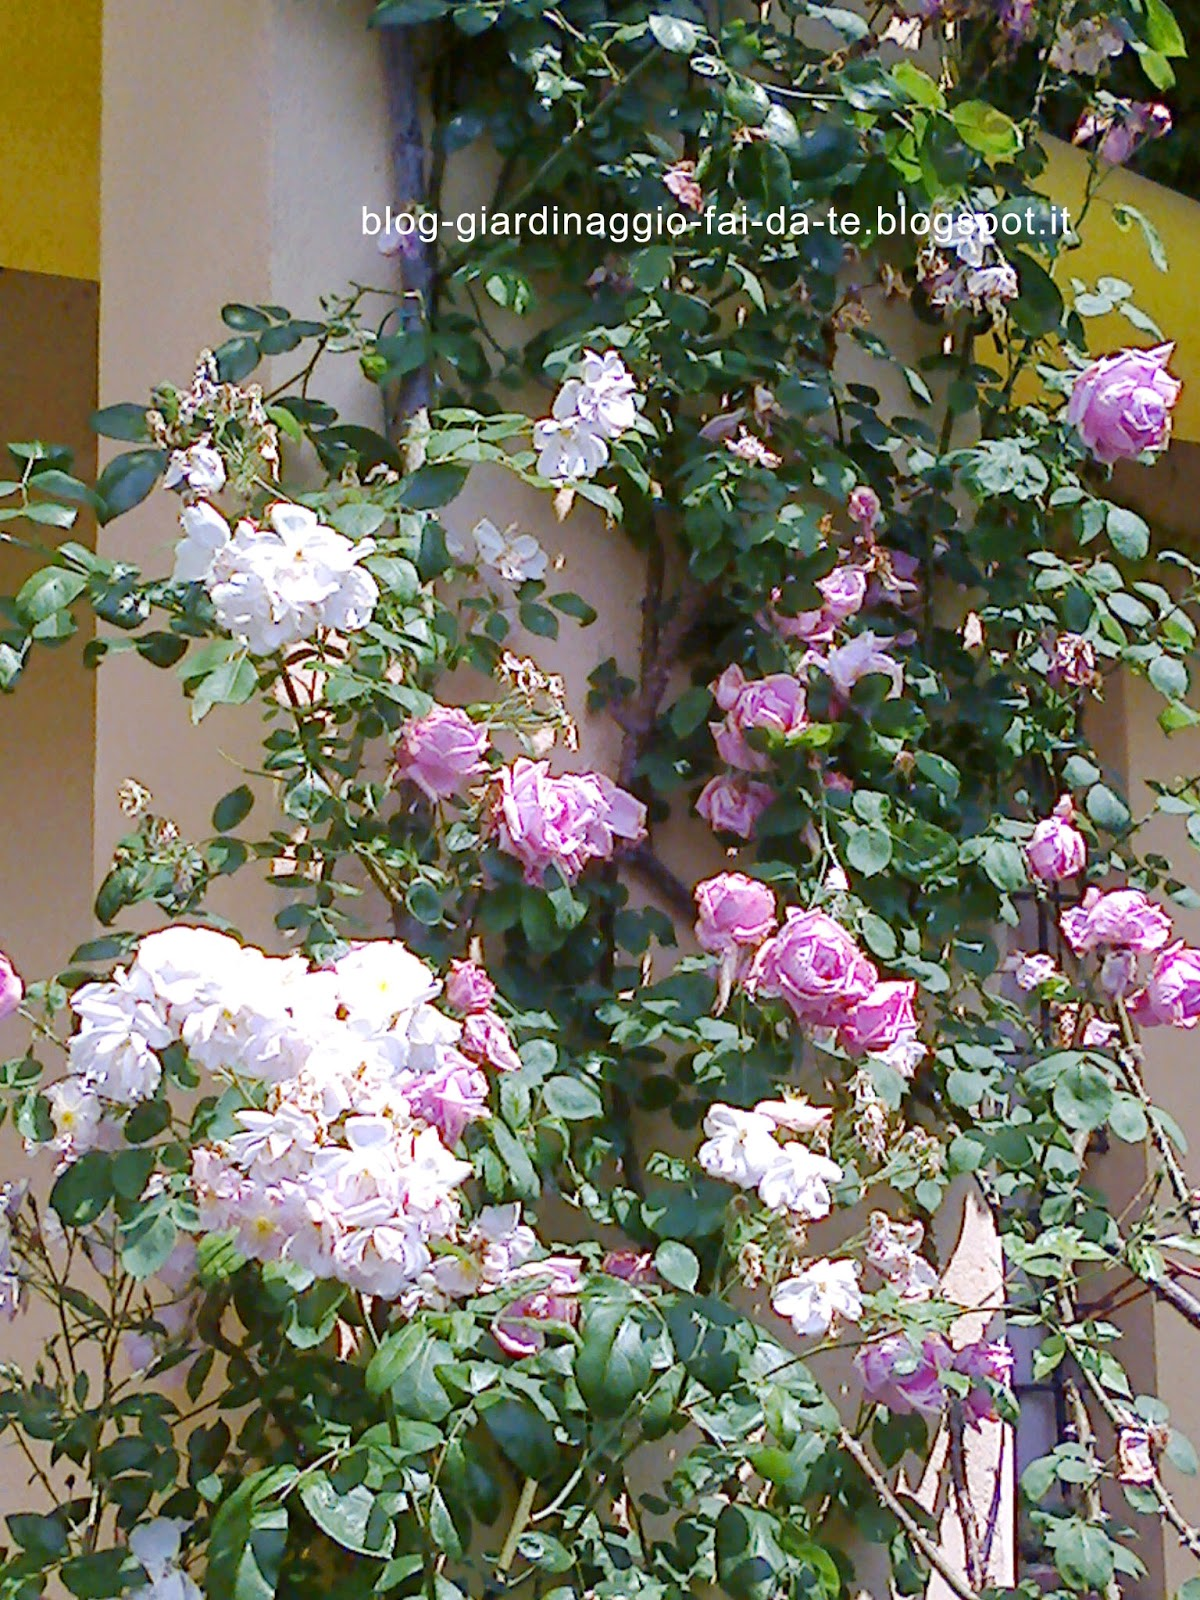 Immagini di giardini fioriti for Giardini fai da te foto